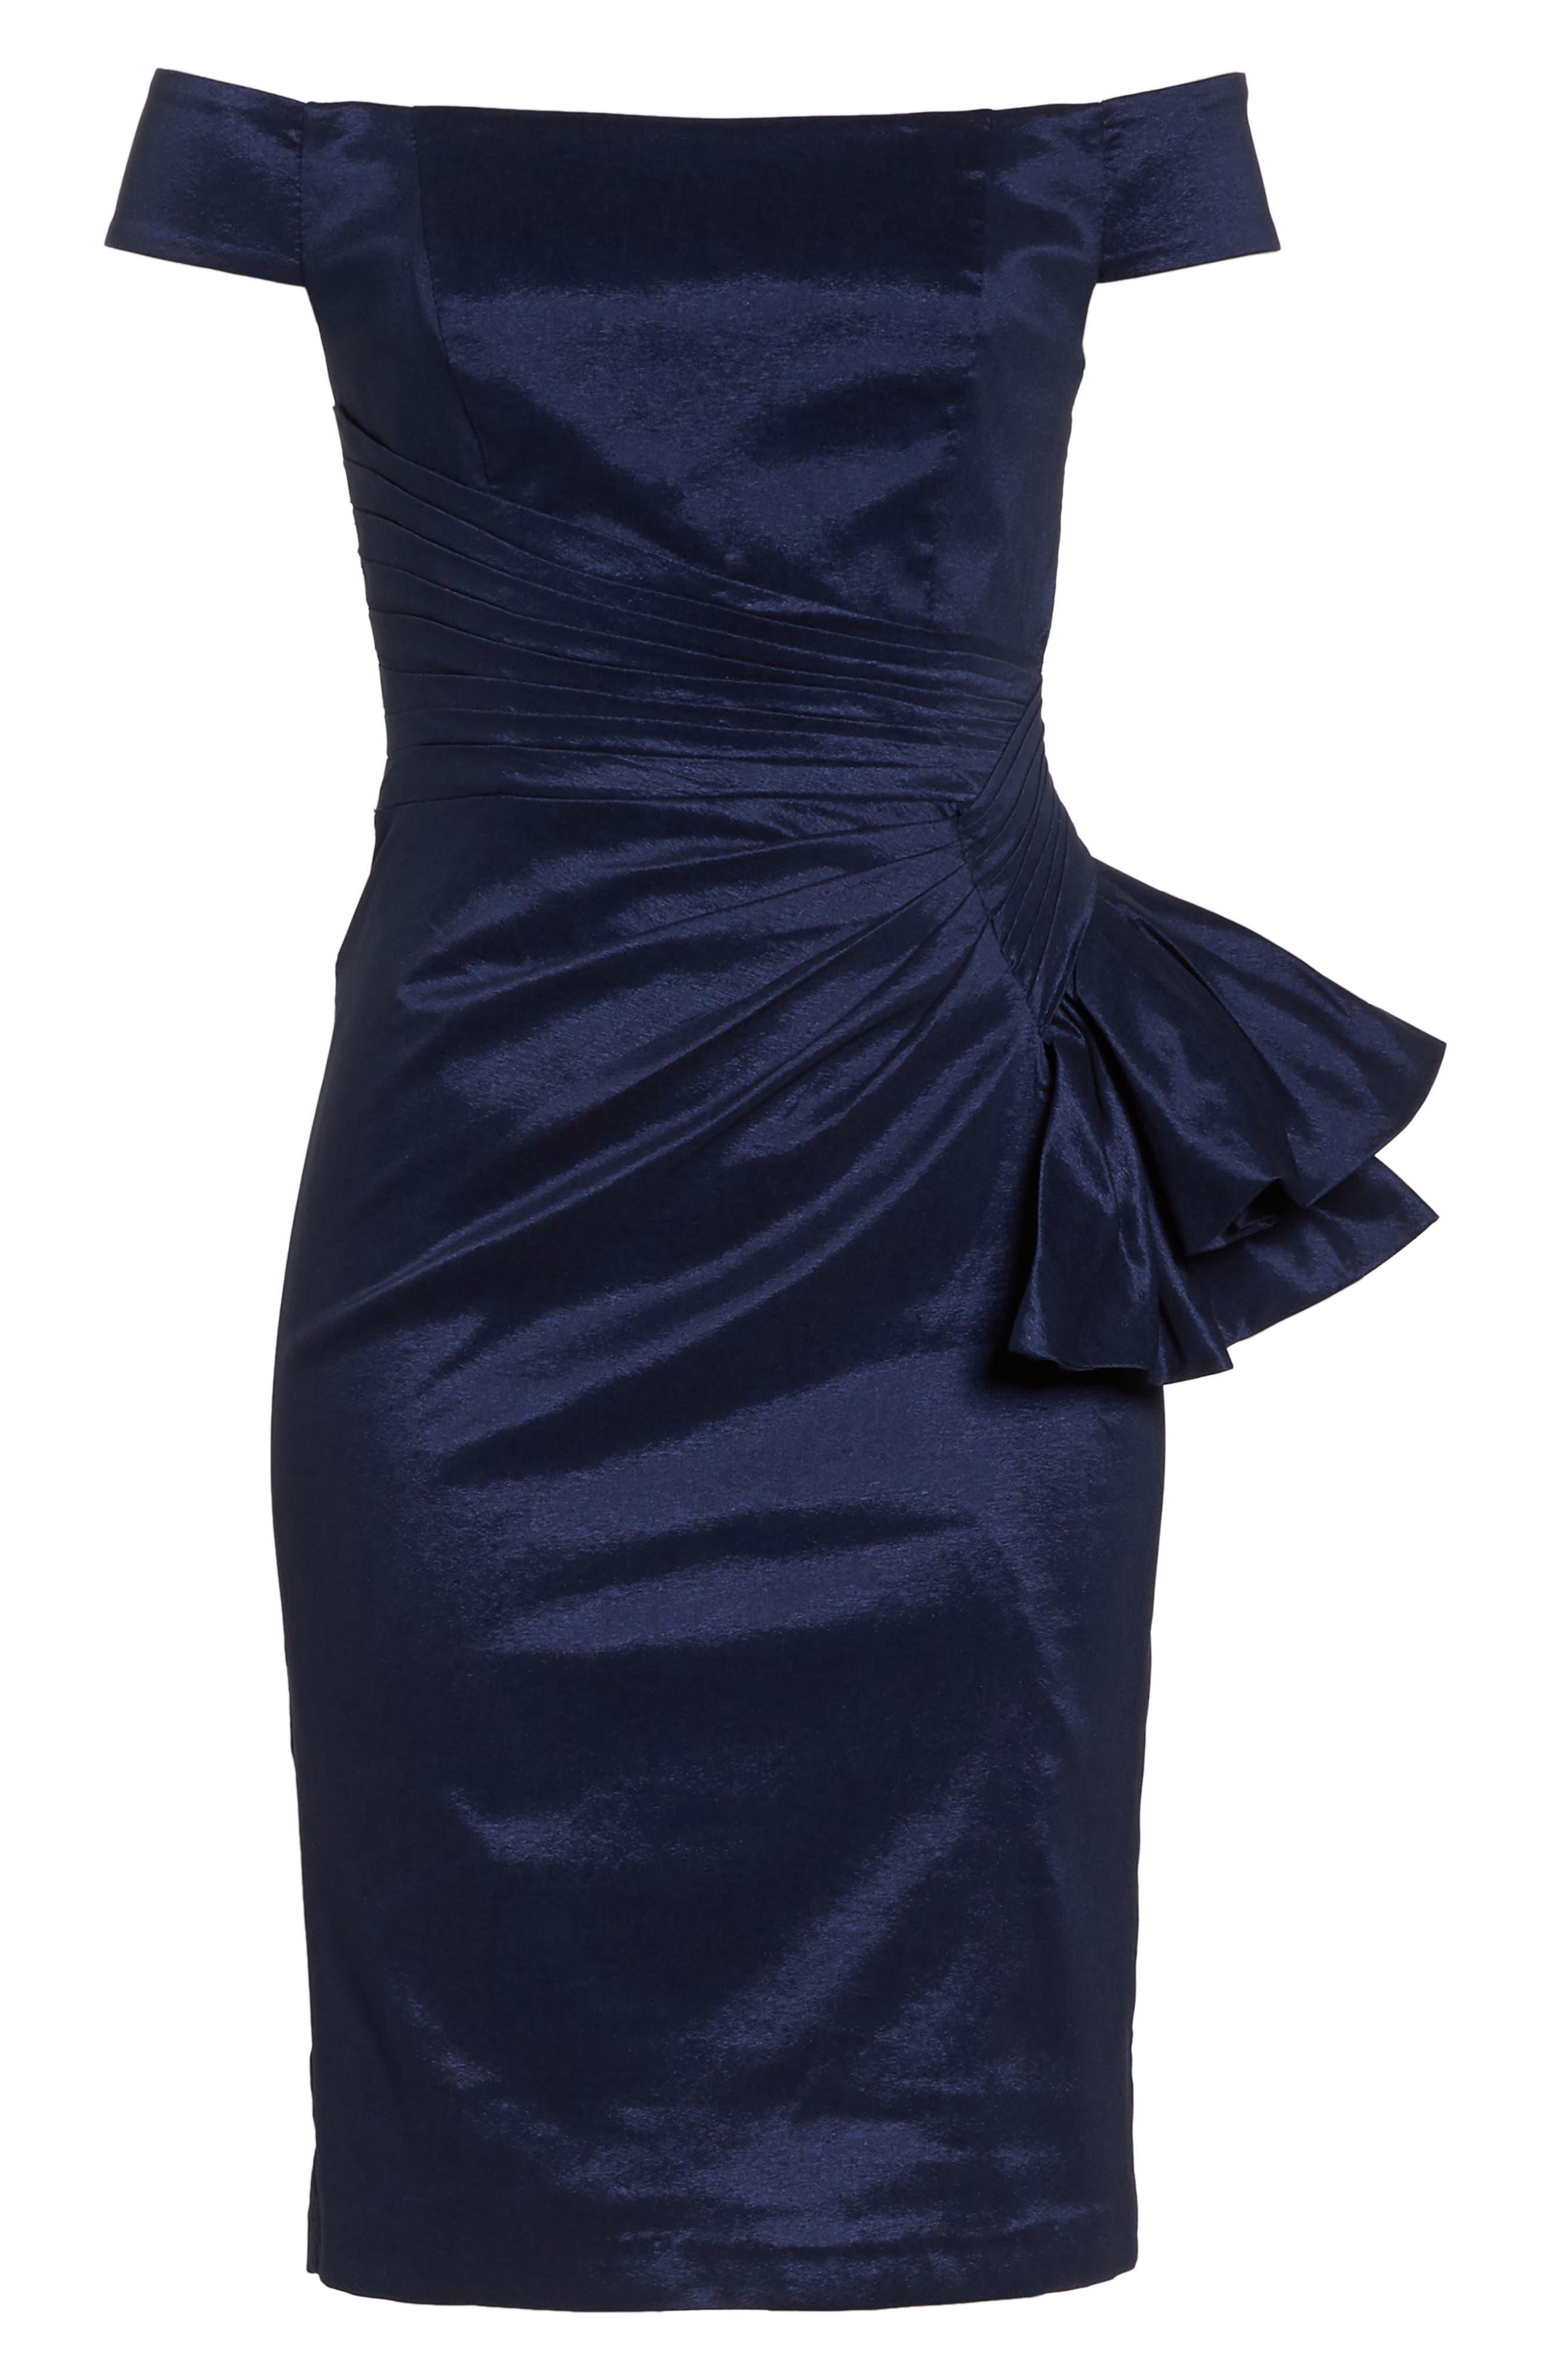 Off the Shoulder Bow Dress,                             Alternate thumbnail 7, color,                             NAVY